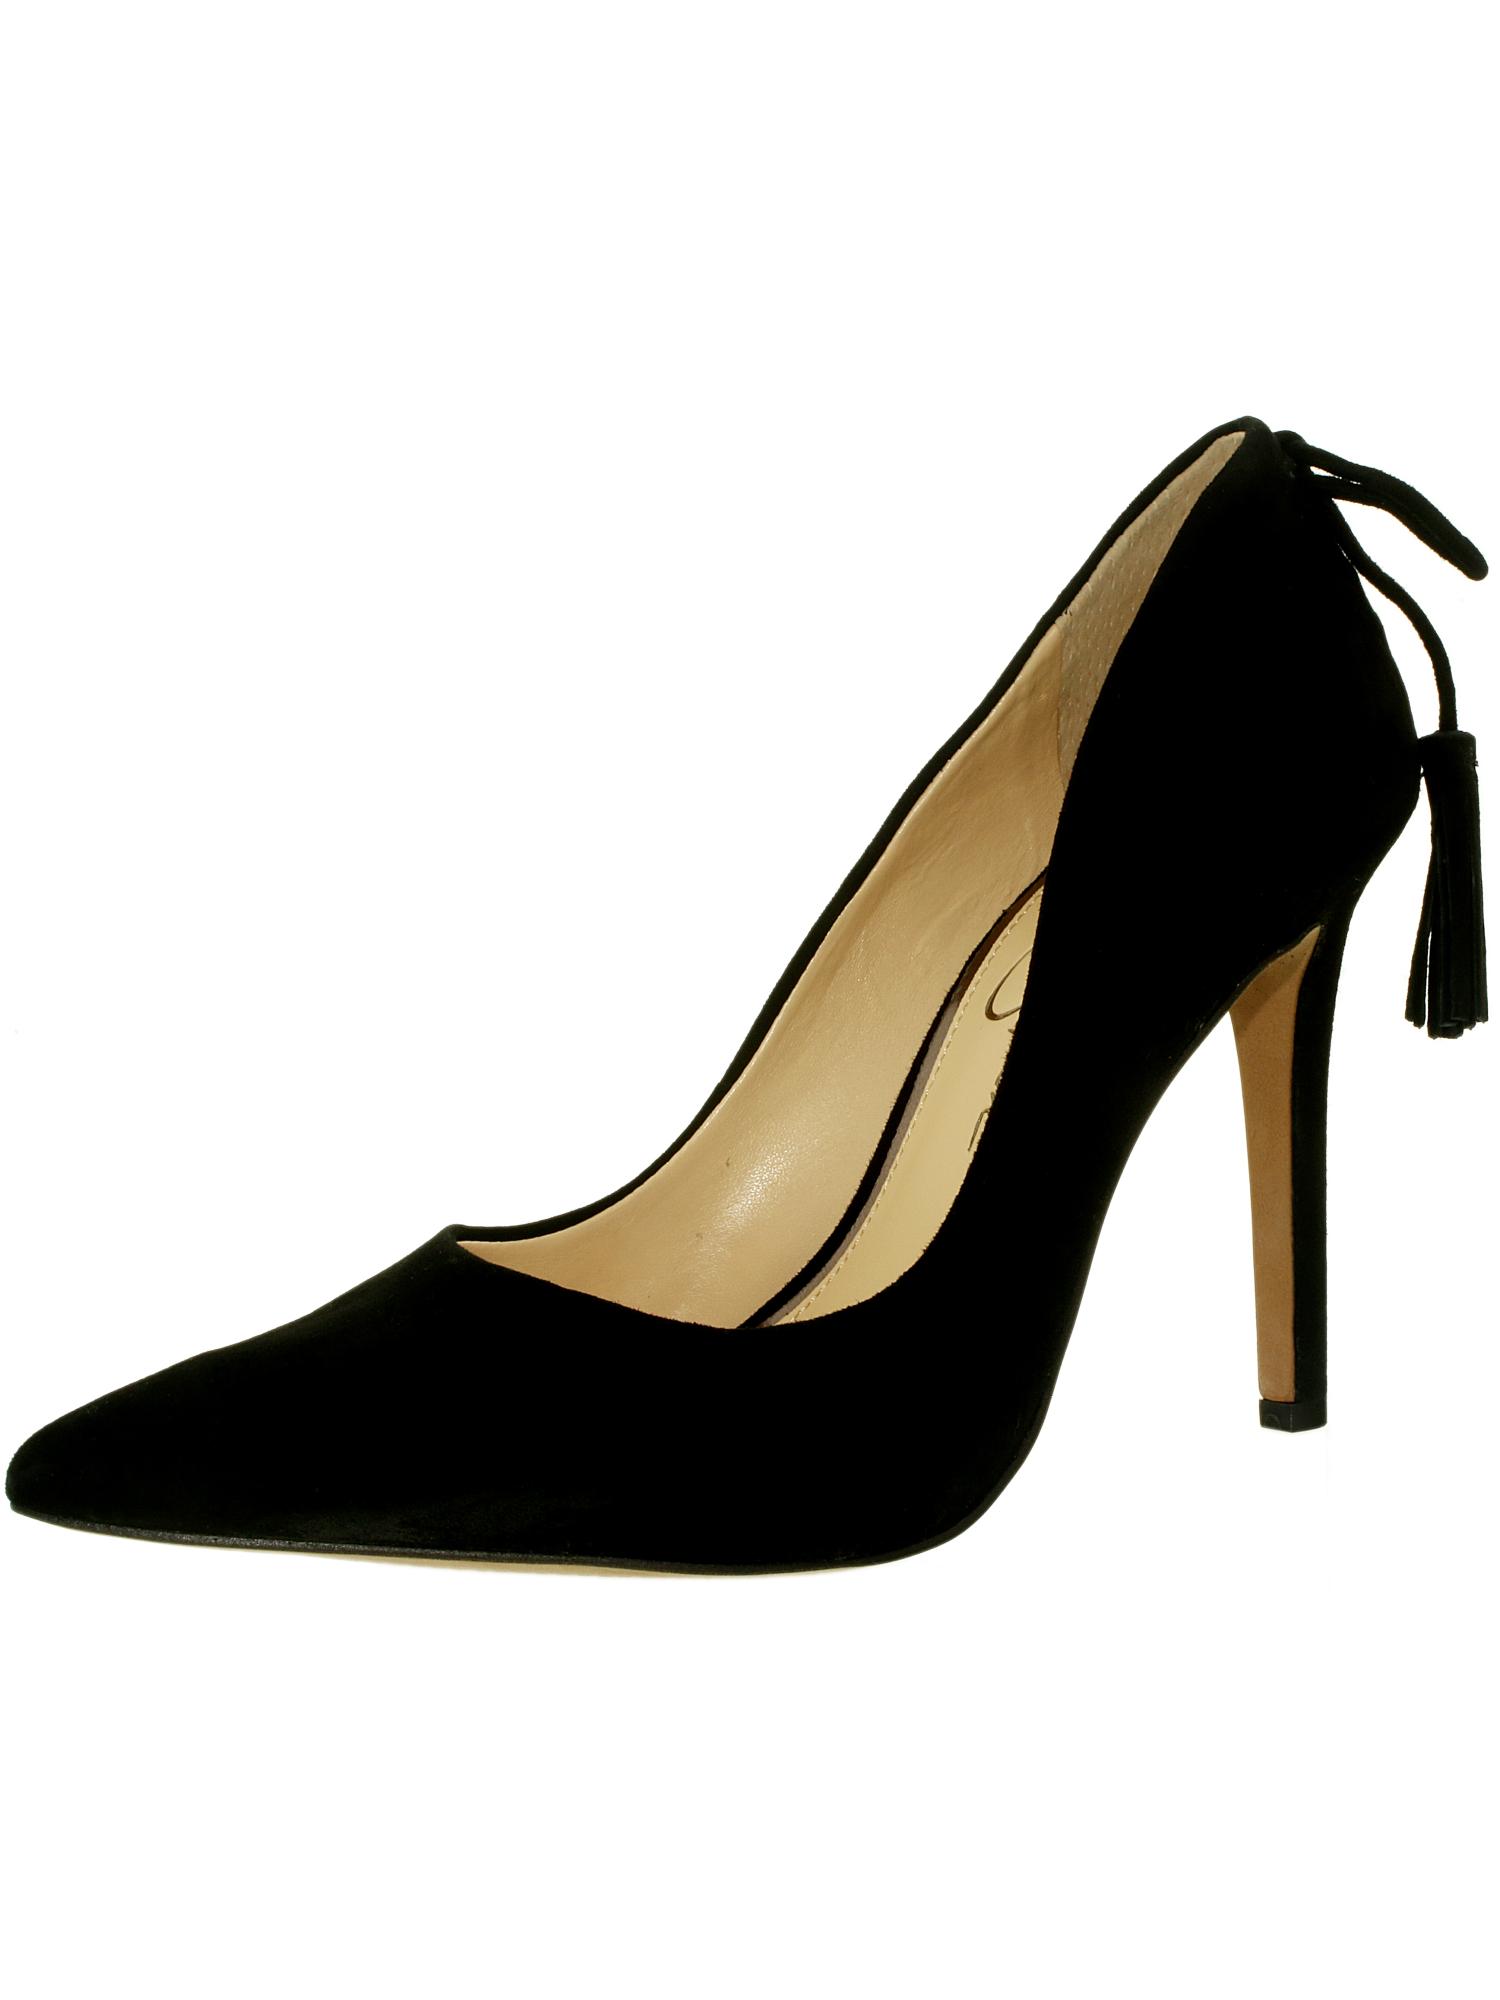 Jessica-Simpson-Women-039-s-Centella-Suede-Ankle-High-Pump